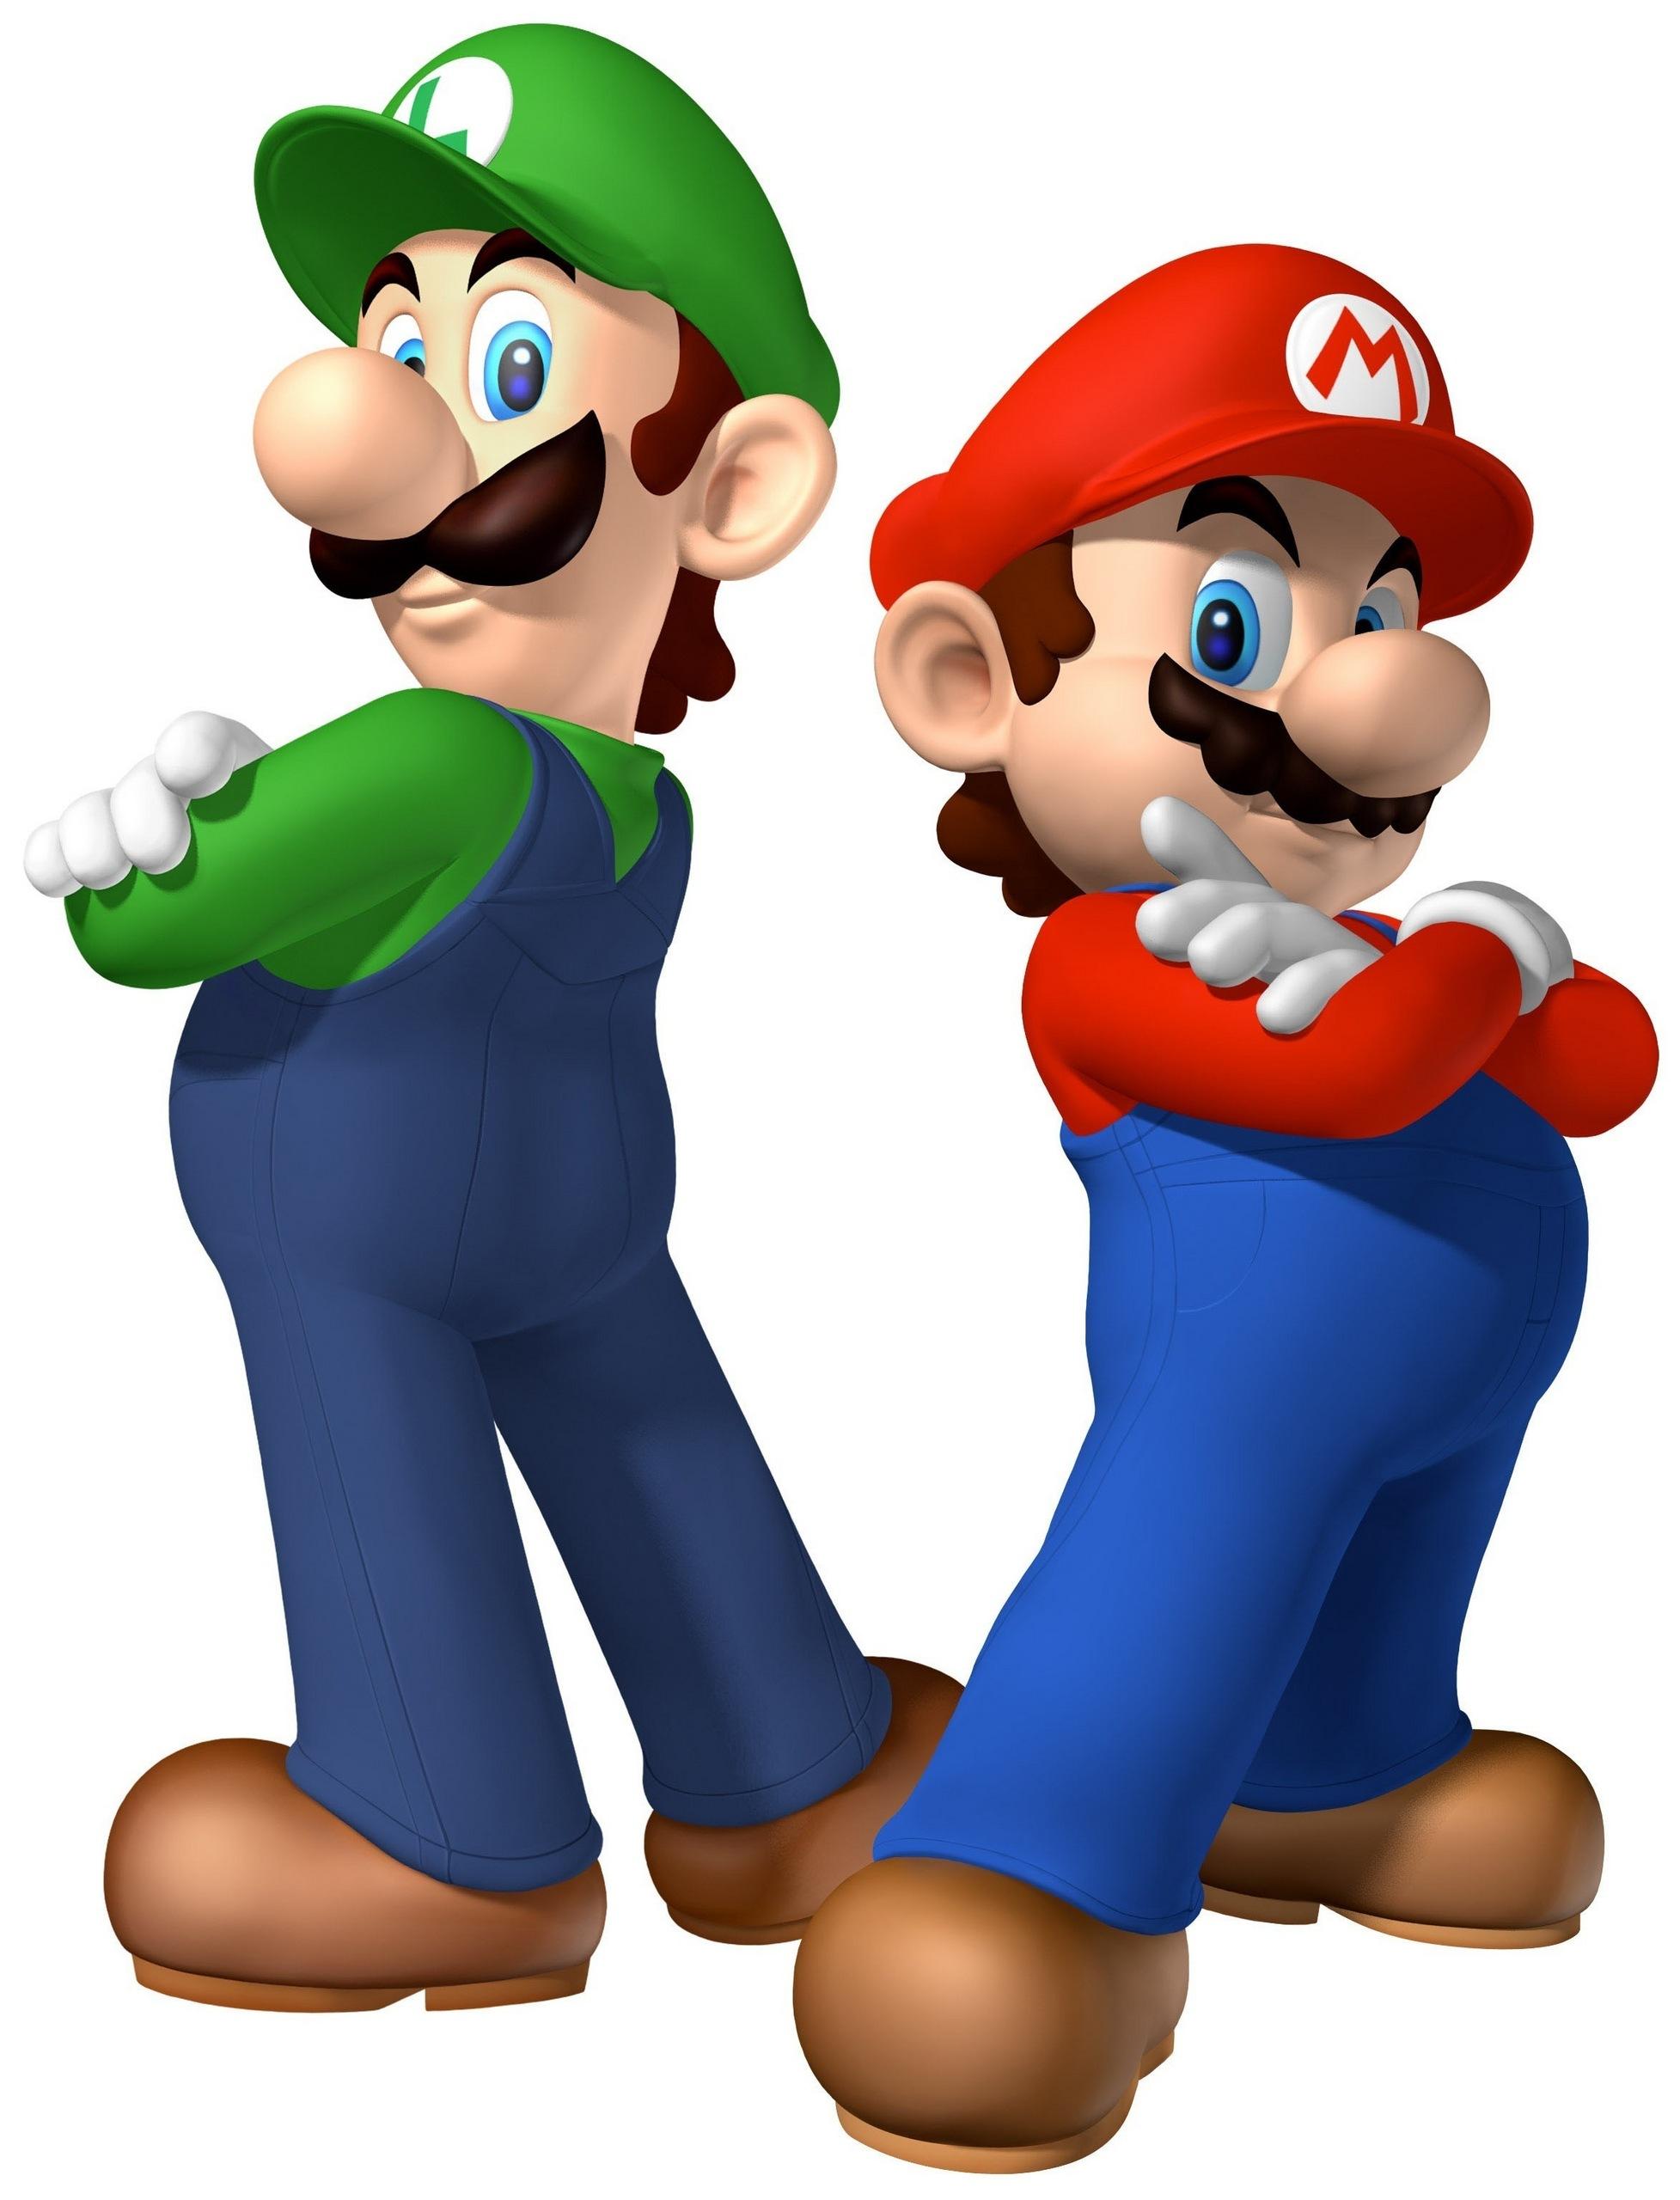 The Mario Bros.